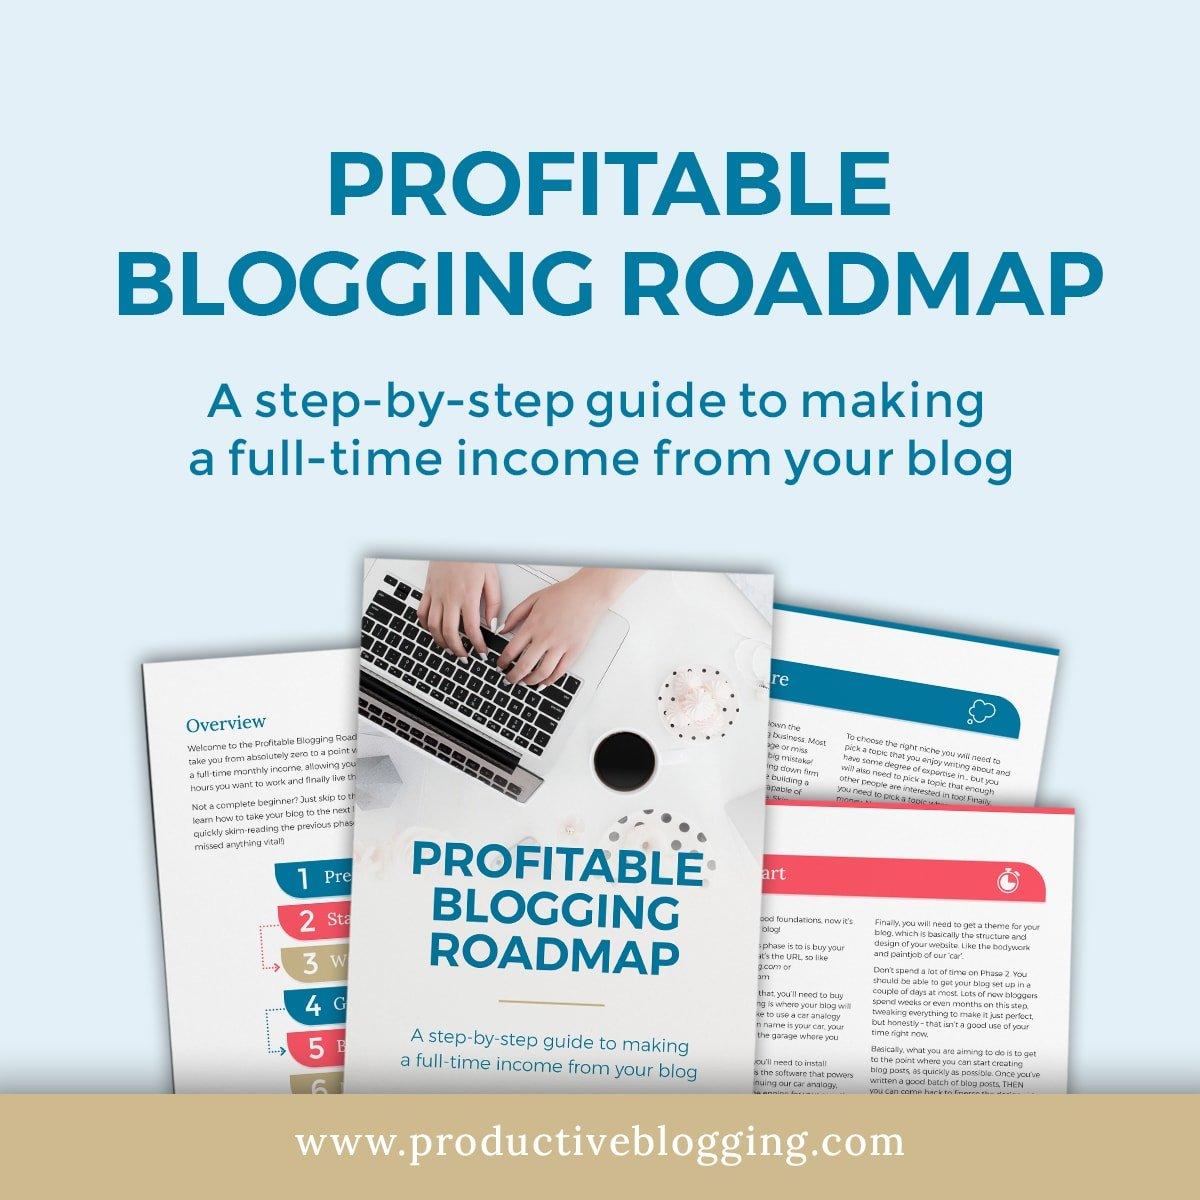 Profitable Blogging Roadmap Hero Image